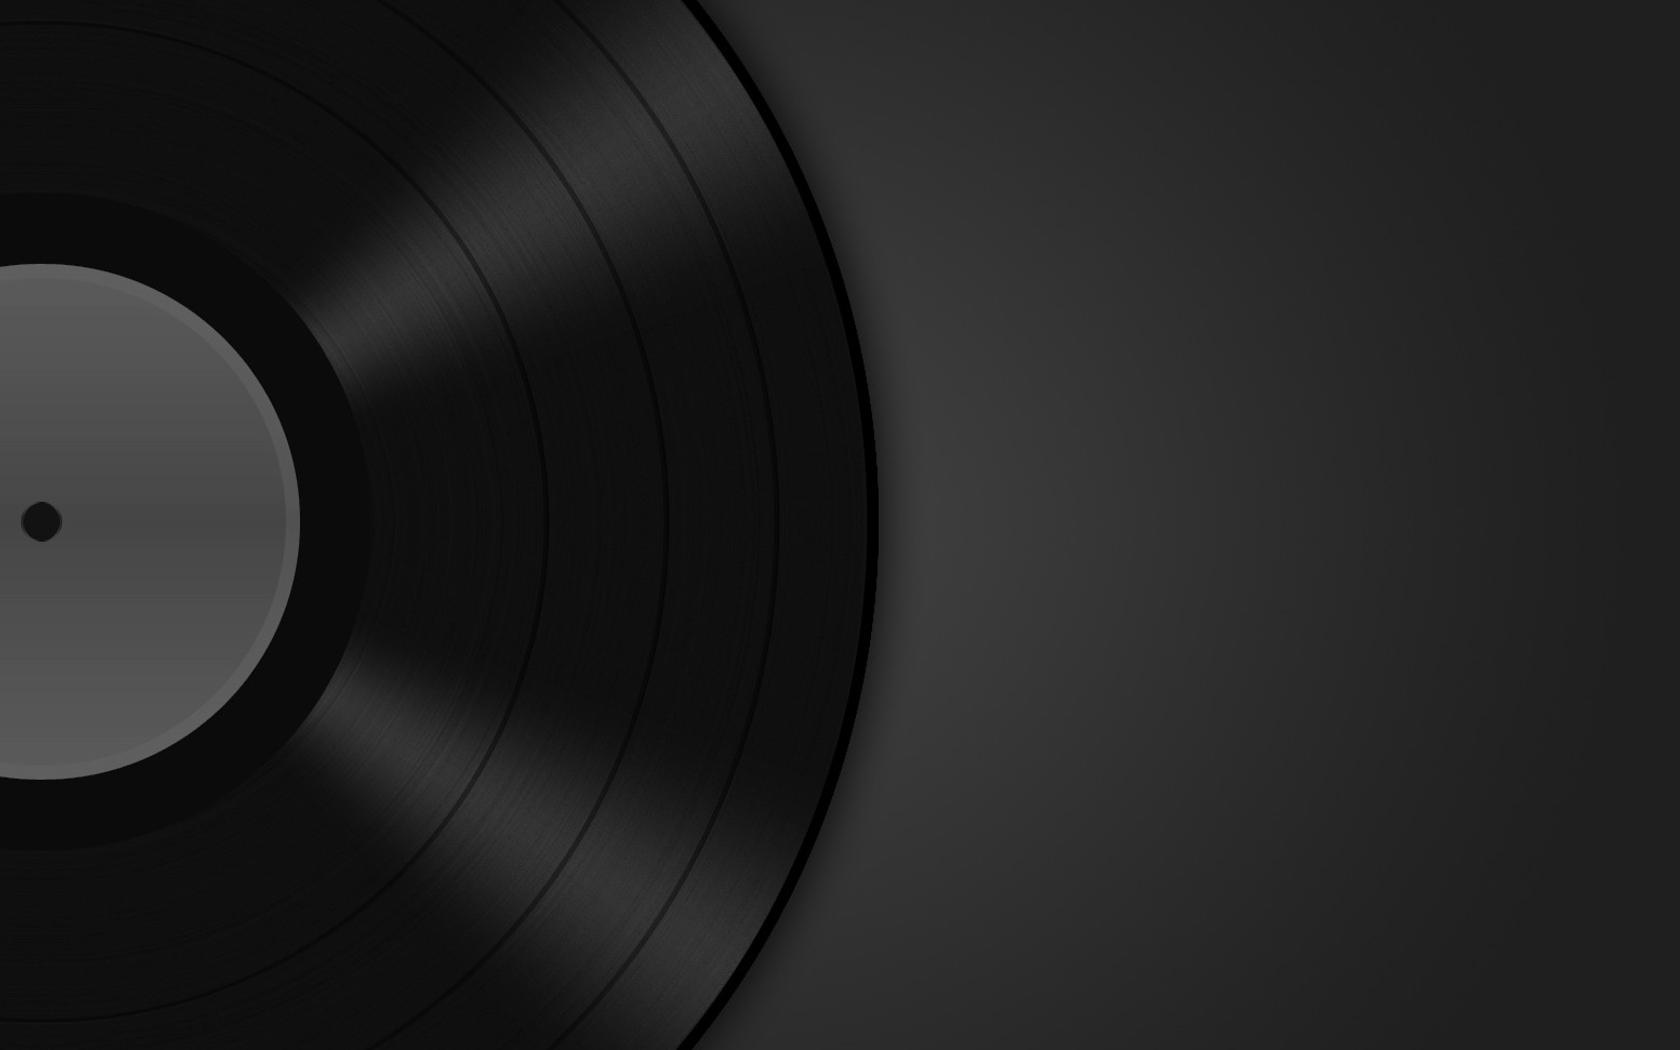 Music Record Wallpaper 1680x1050 Music Record Vynil 1680x1050